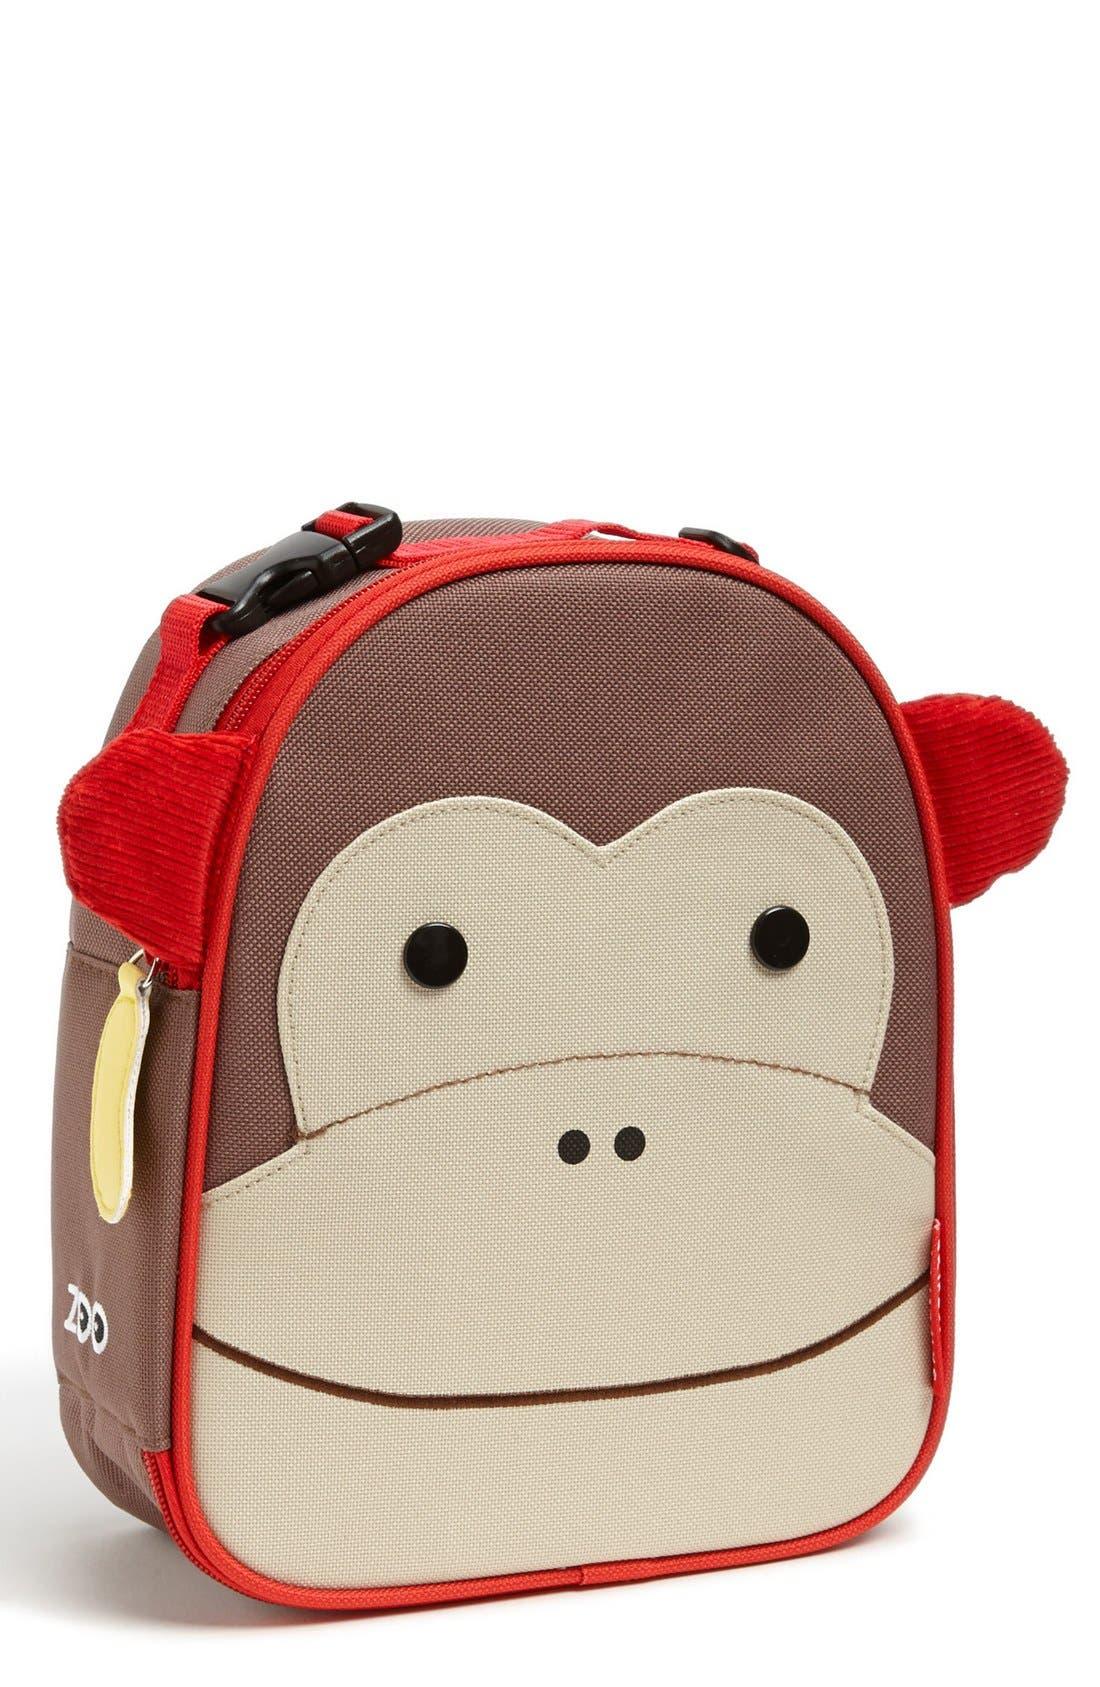 Zoo Lunch Bag,                             Main thumbnail 1, color,                             MONKEY